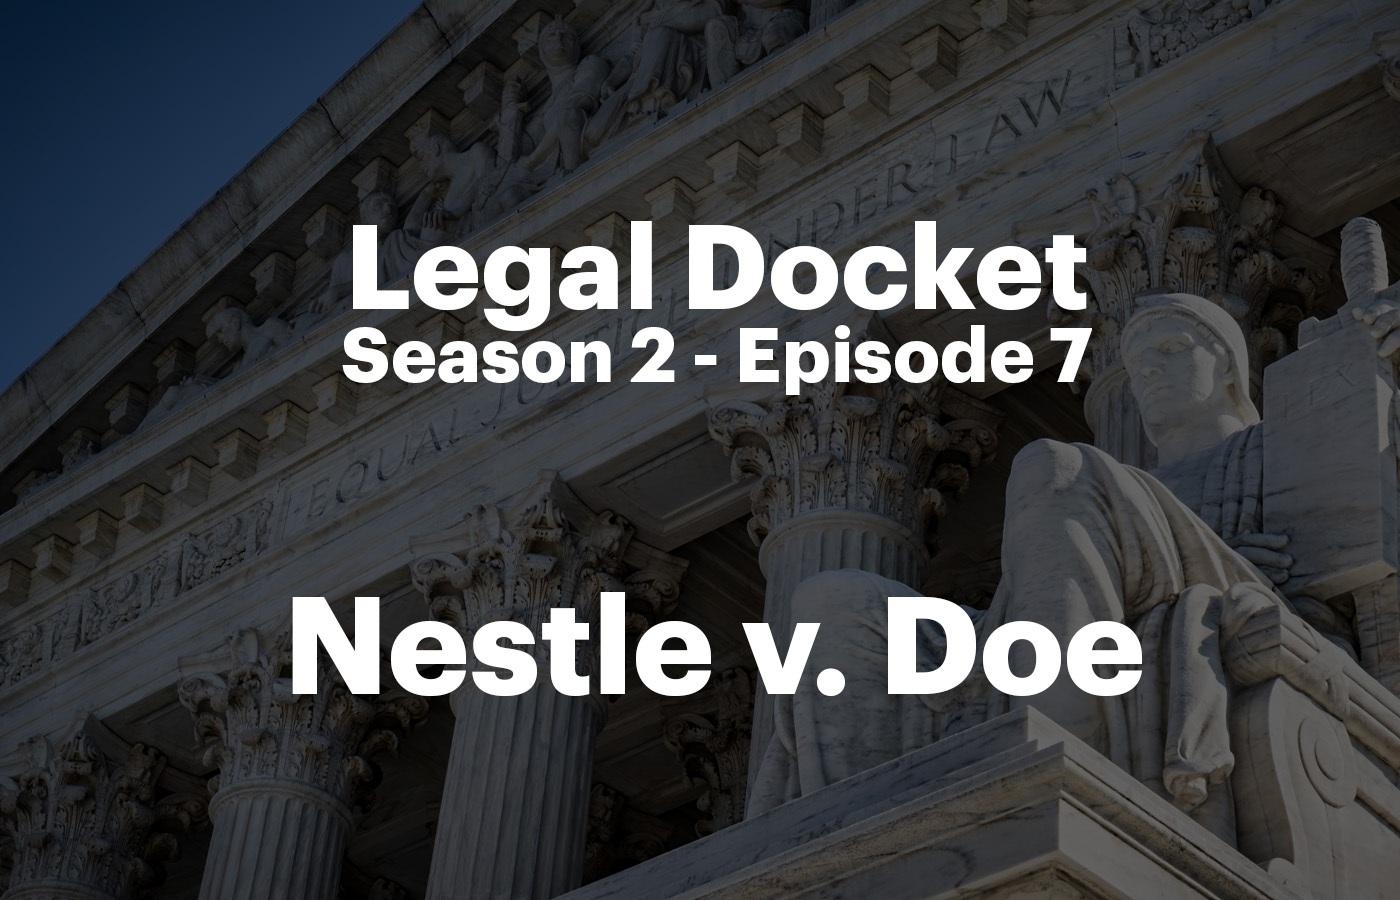 Legal Docket S2 E7